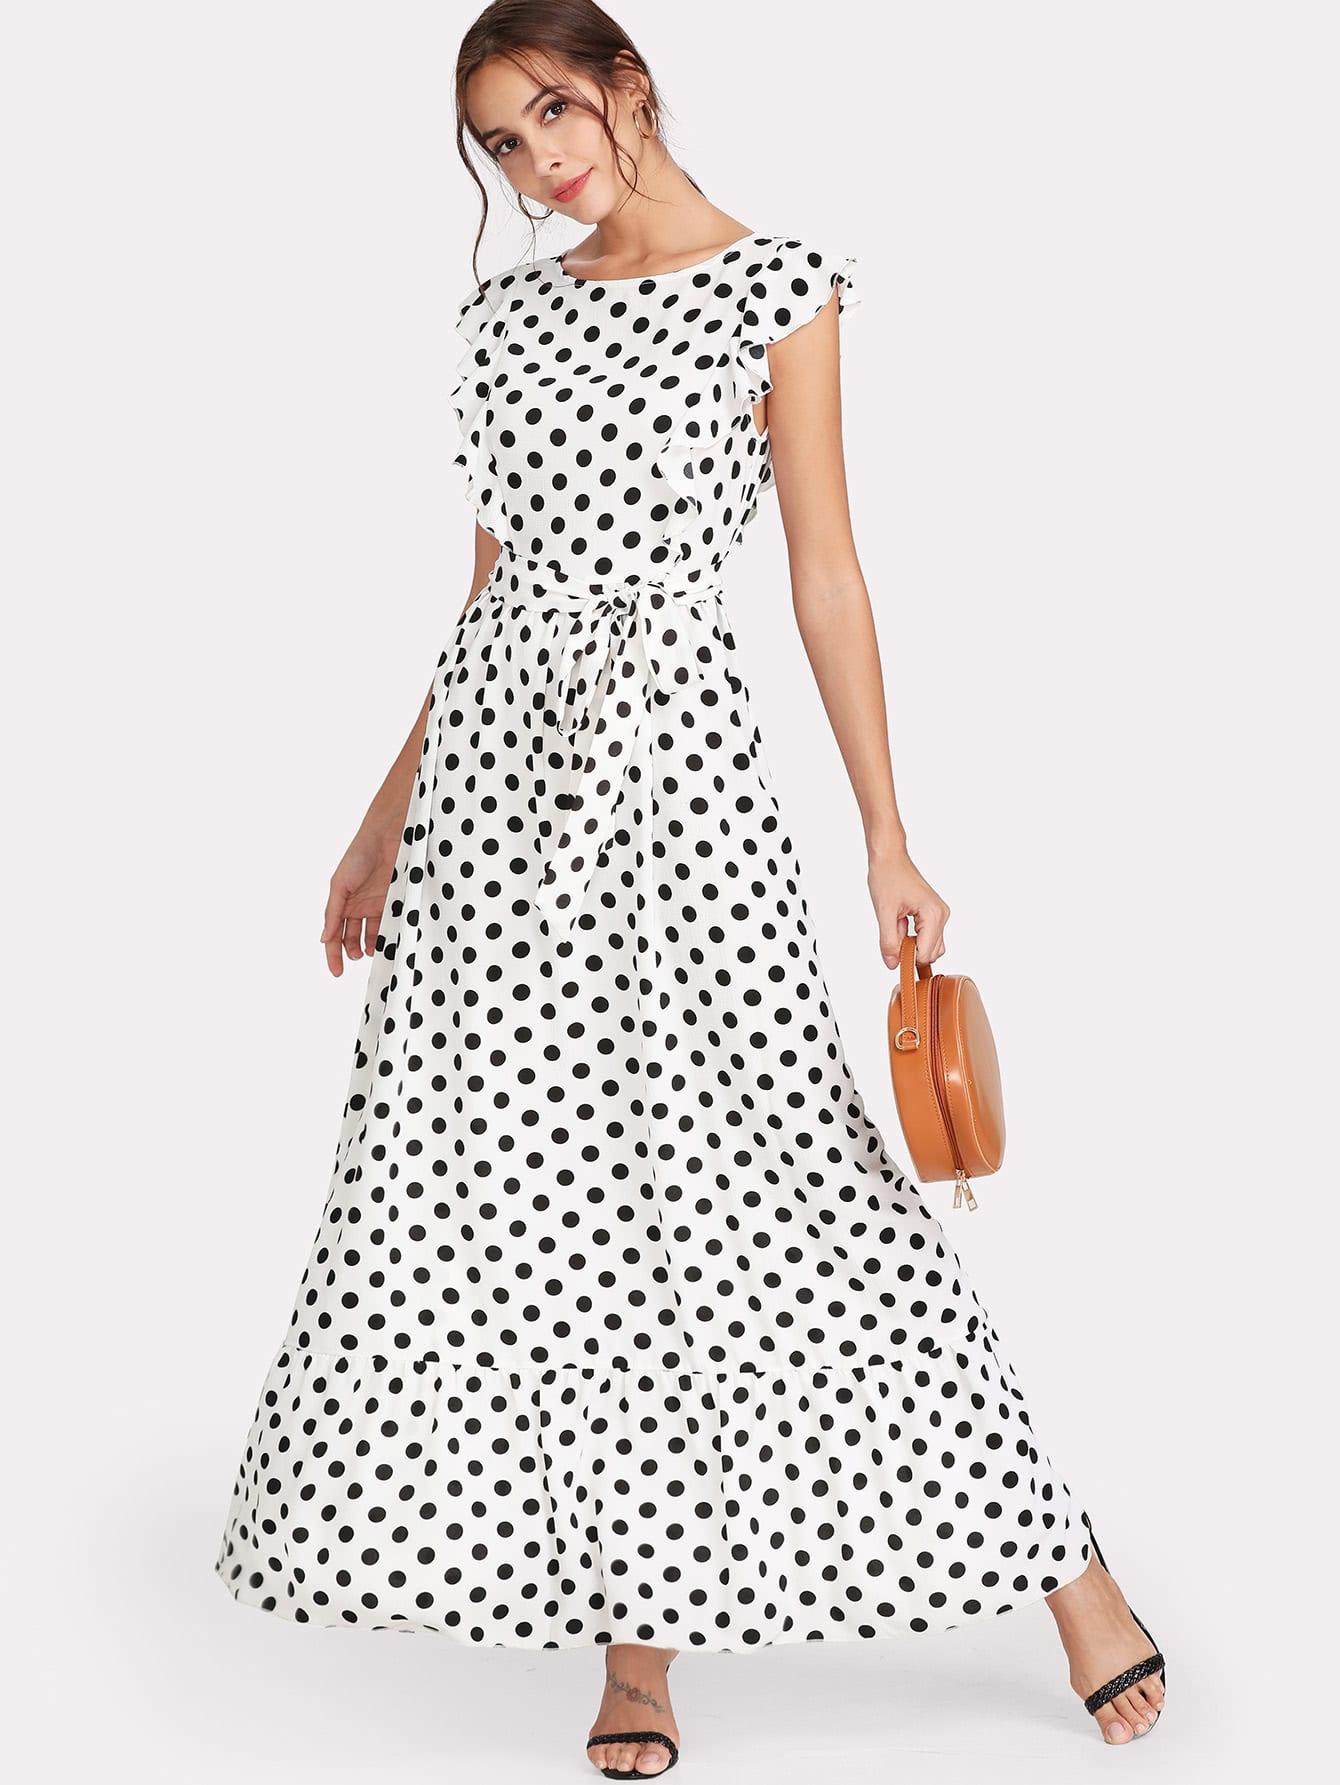 Ruffle Trim Polka Dot Textured Dress ruffle trim belted polka dot dress